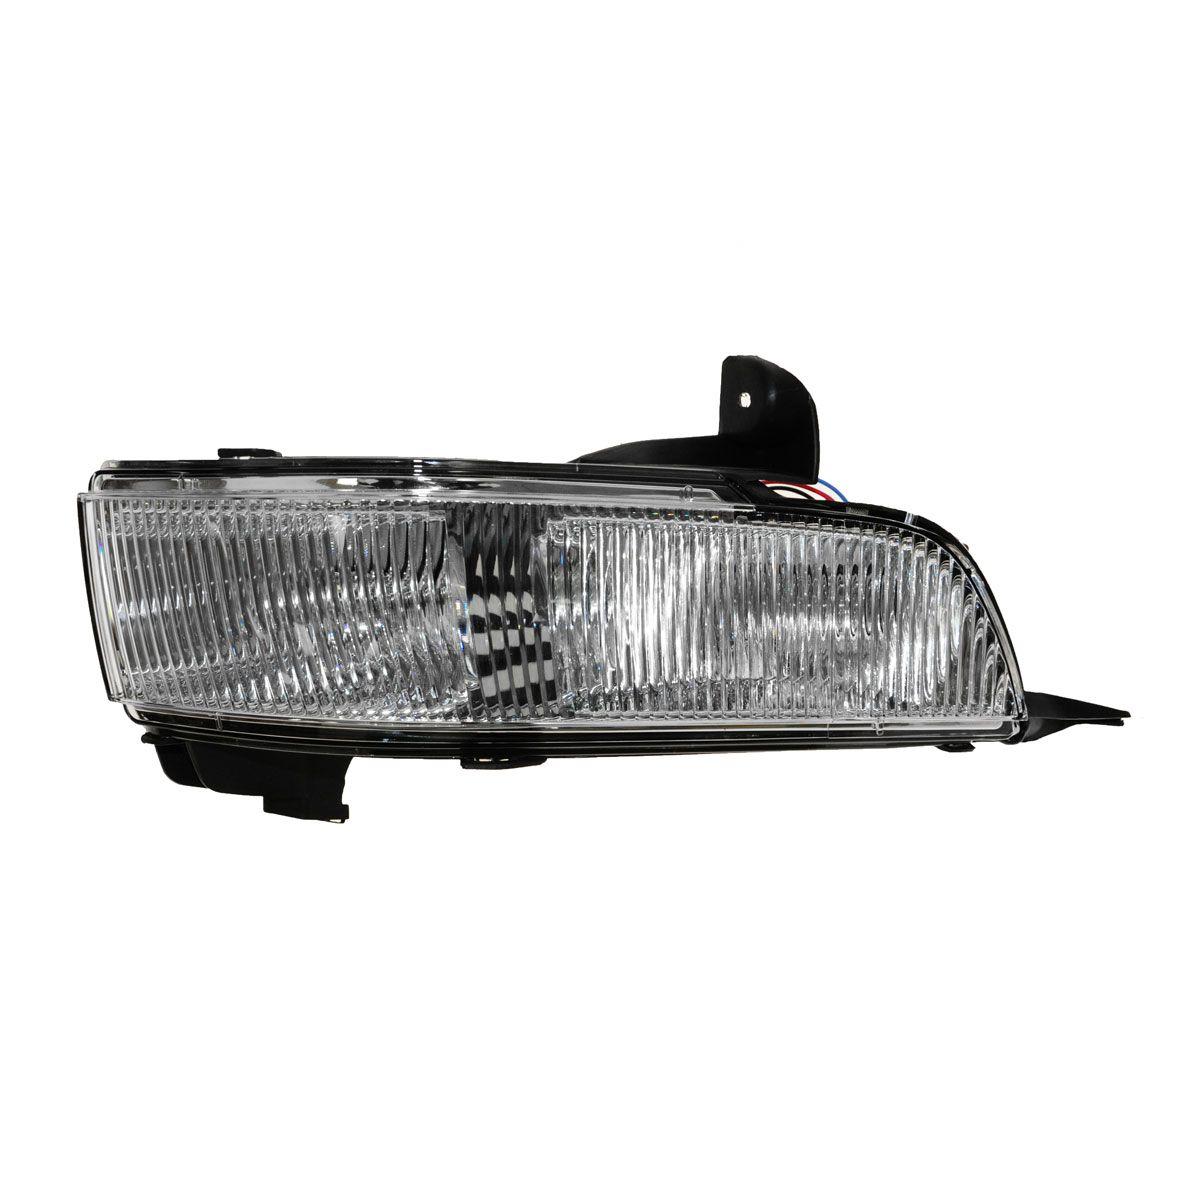 06 cadillac dts headlight wiring  06  free engine image